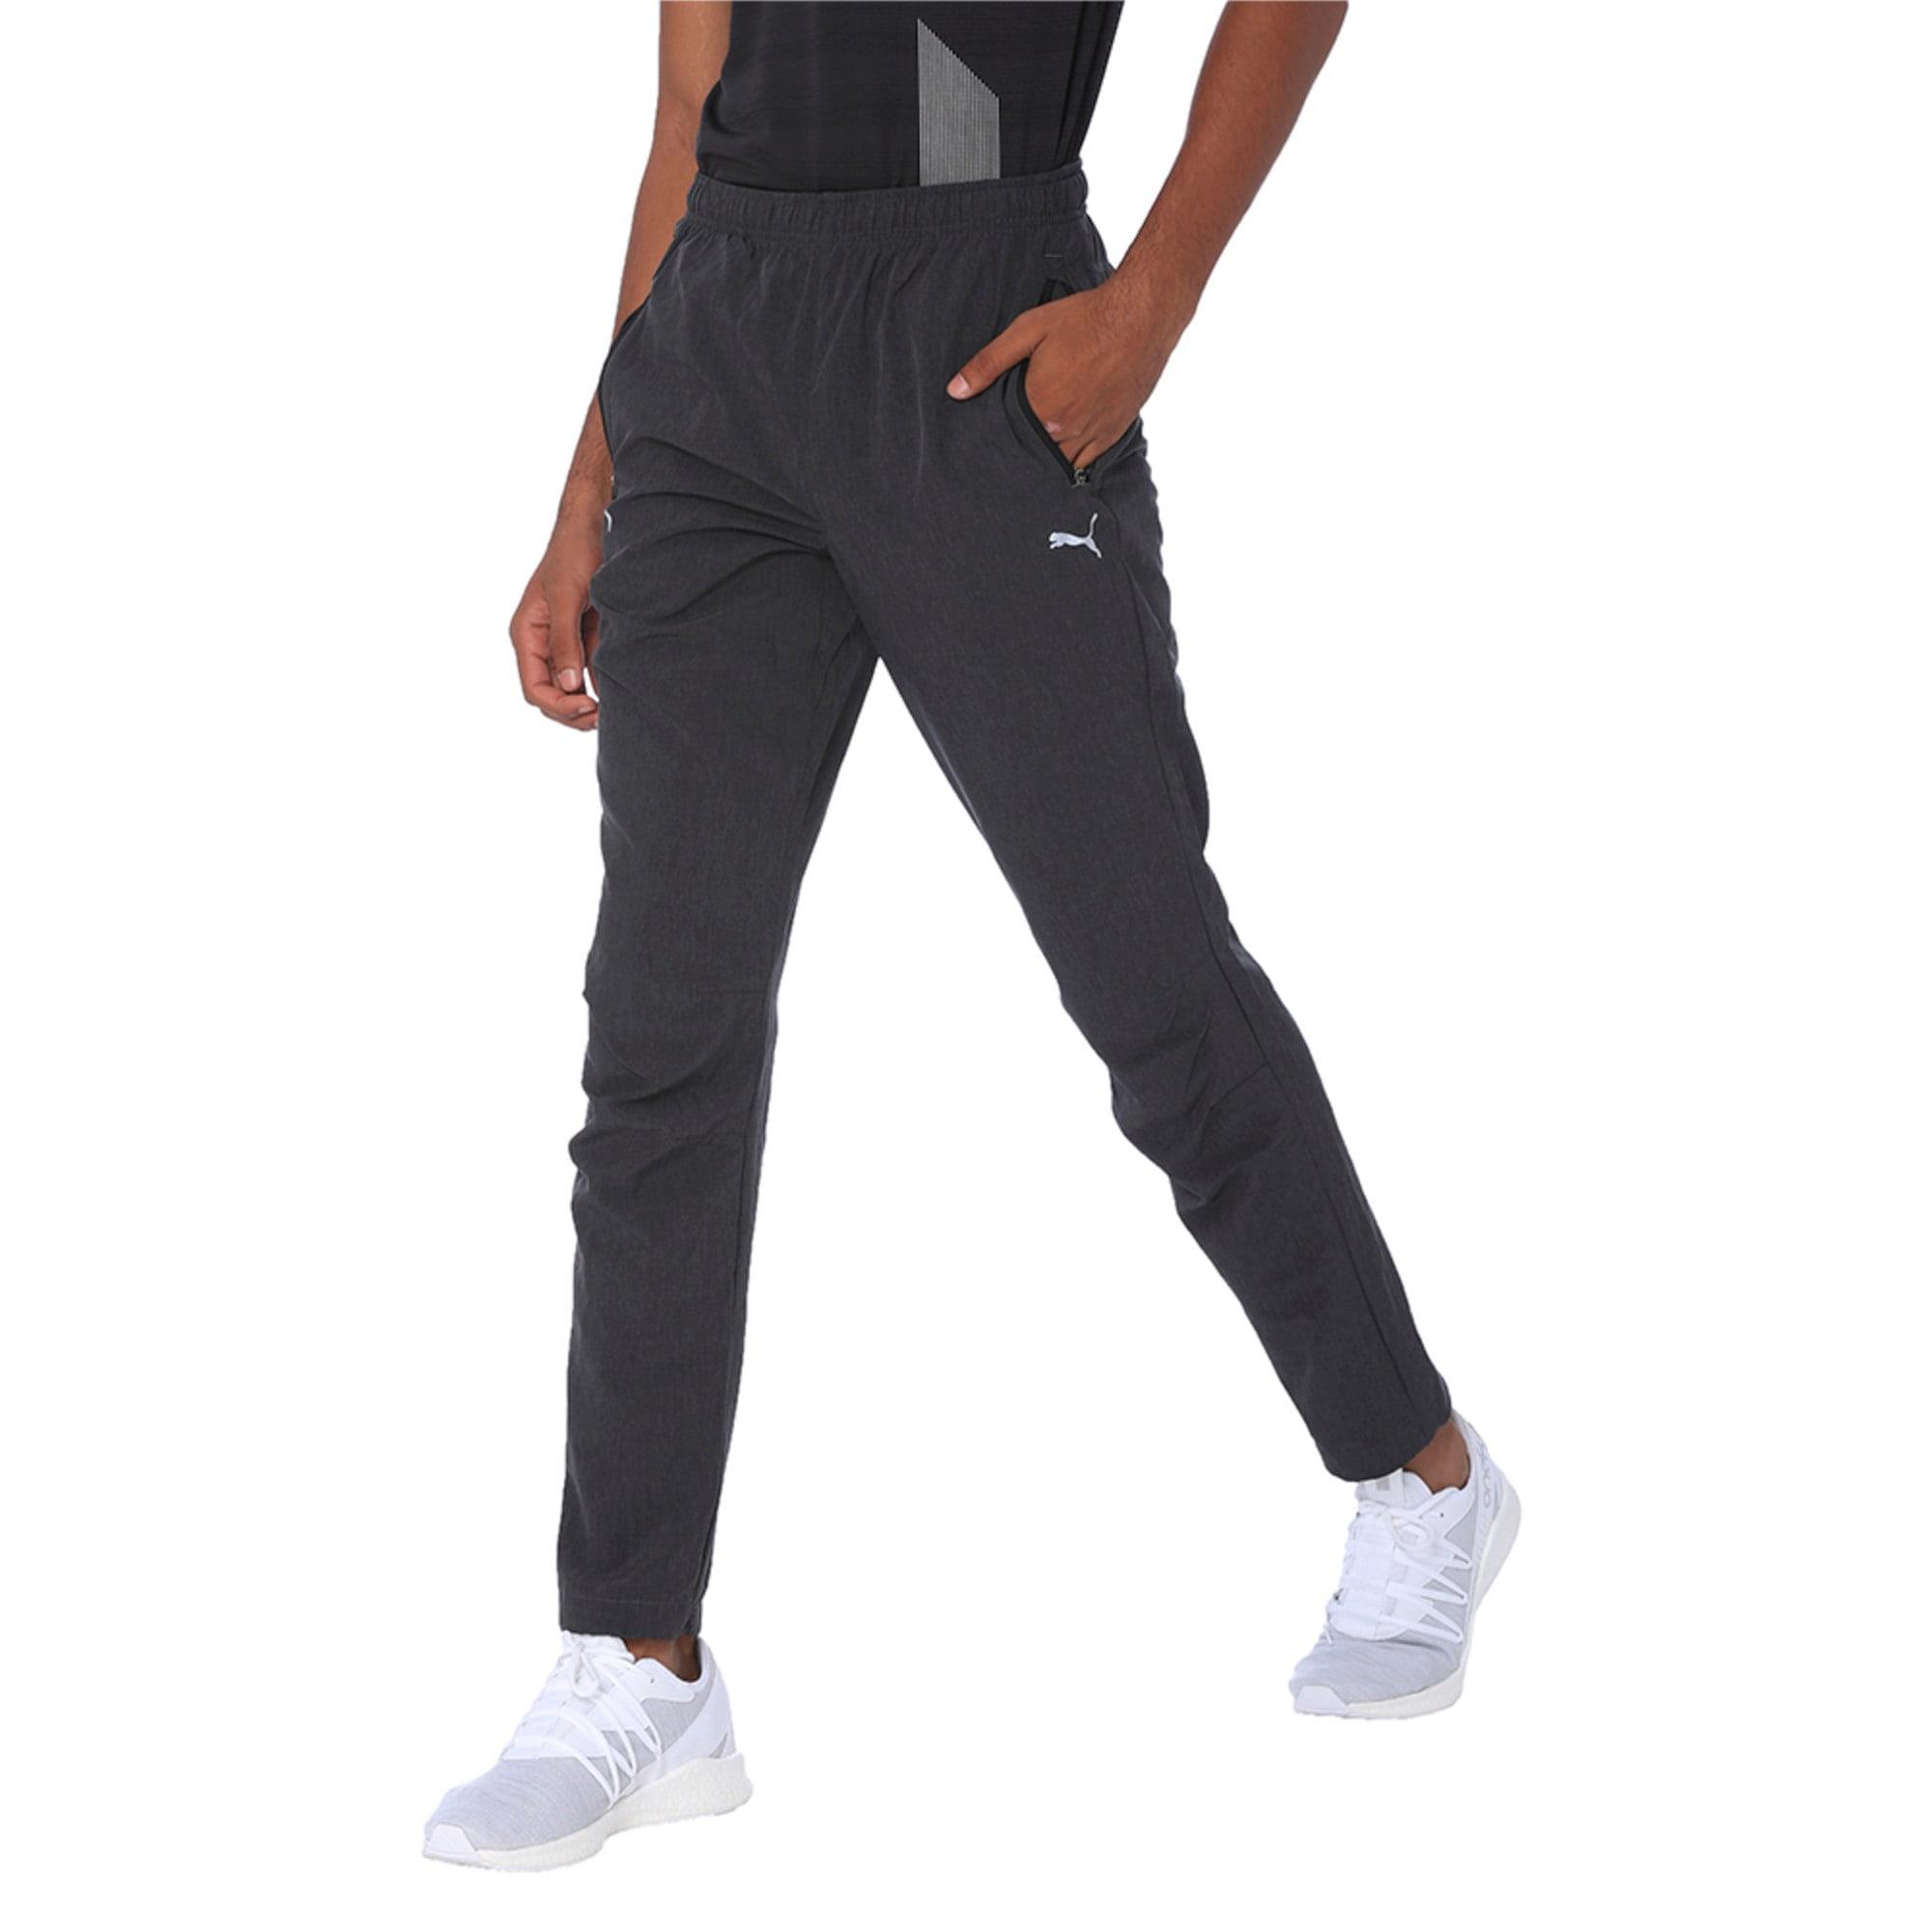 Thumbnail 4 of one8 VK Men's Active Pants, Dark Gray Heather, medium-IND